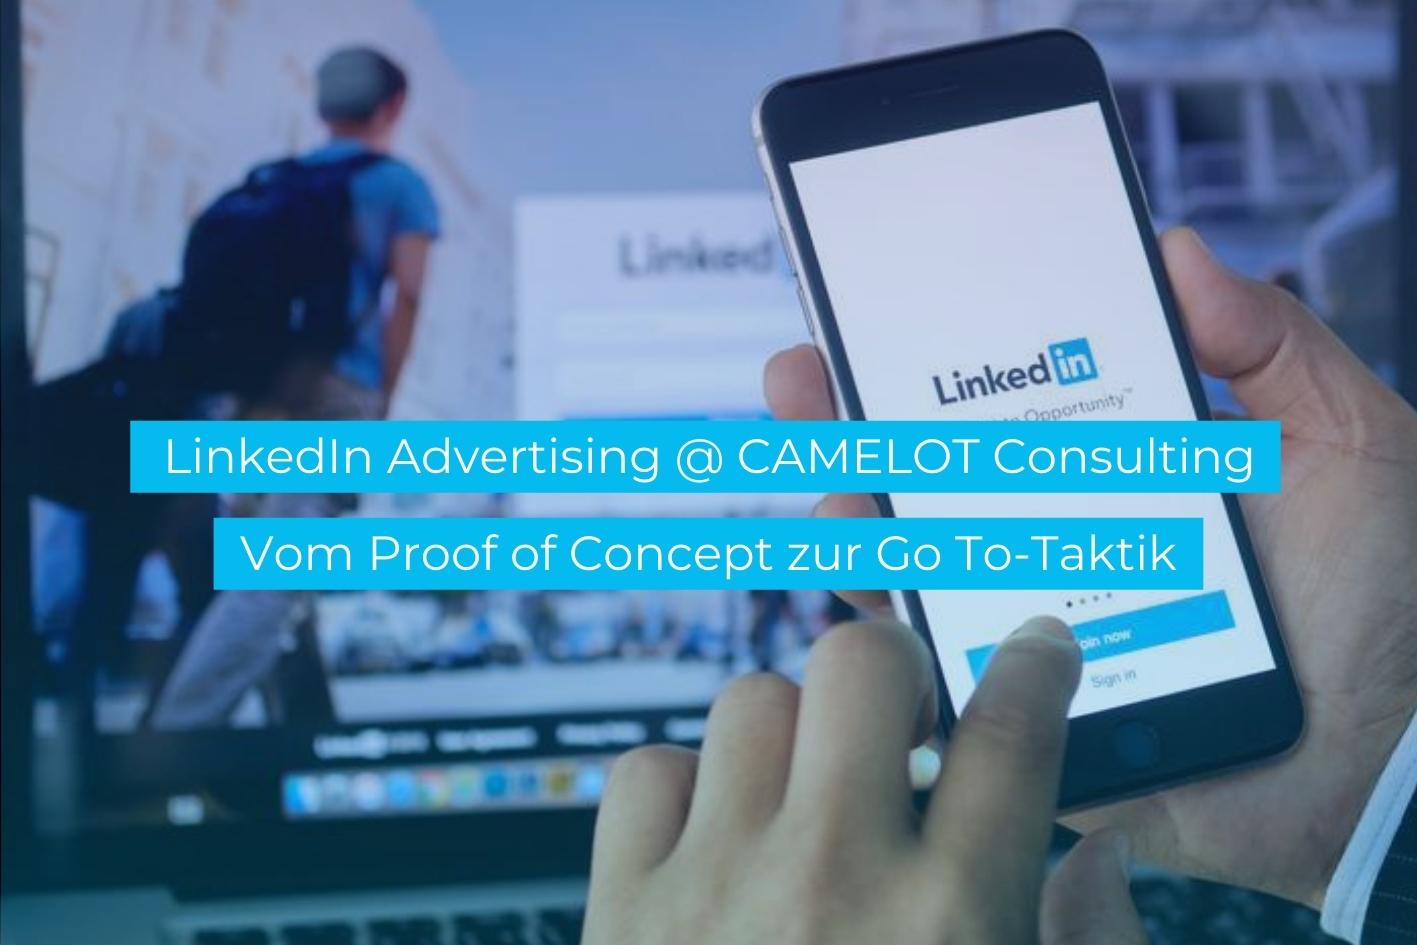 LinkedIn Advertising @ CAMELOT